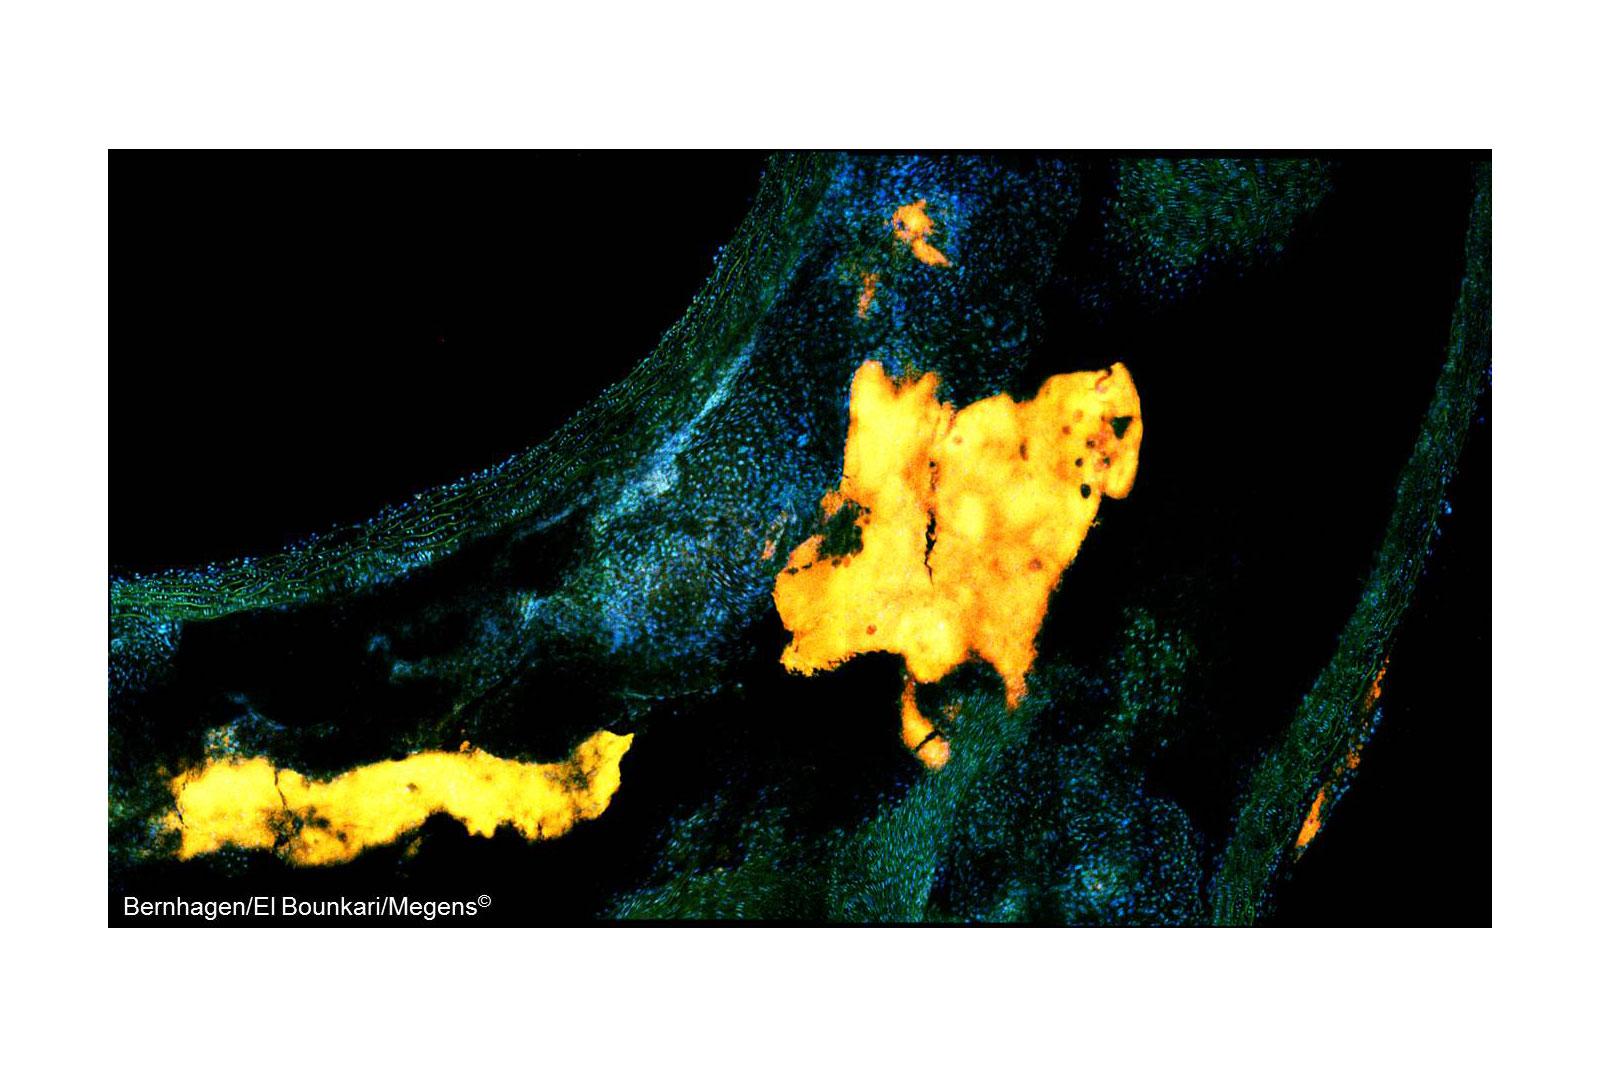 Multi Photon Microscopy